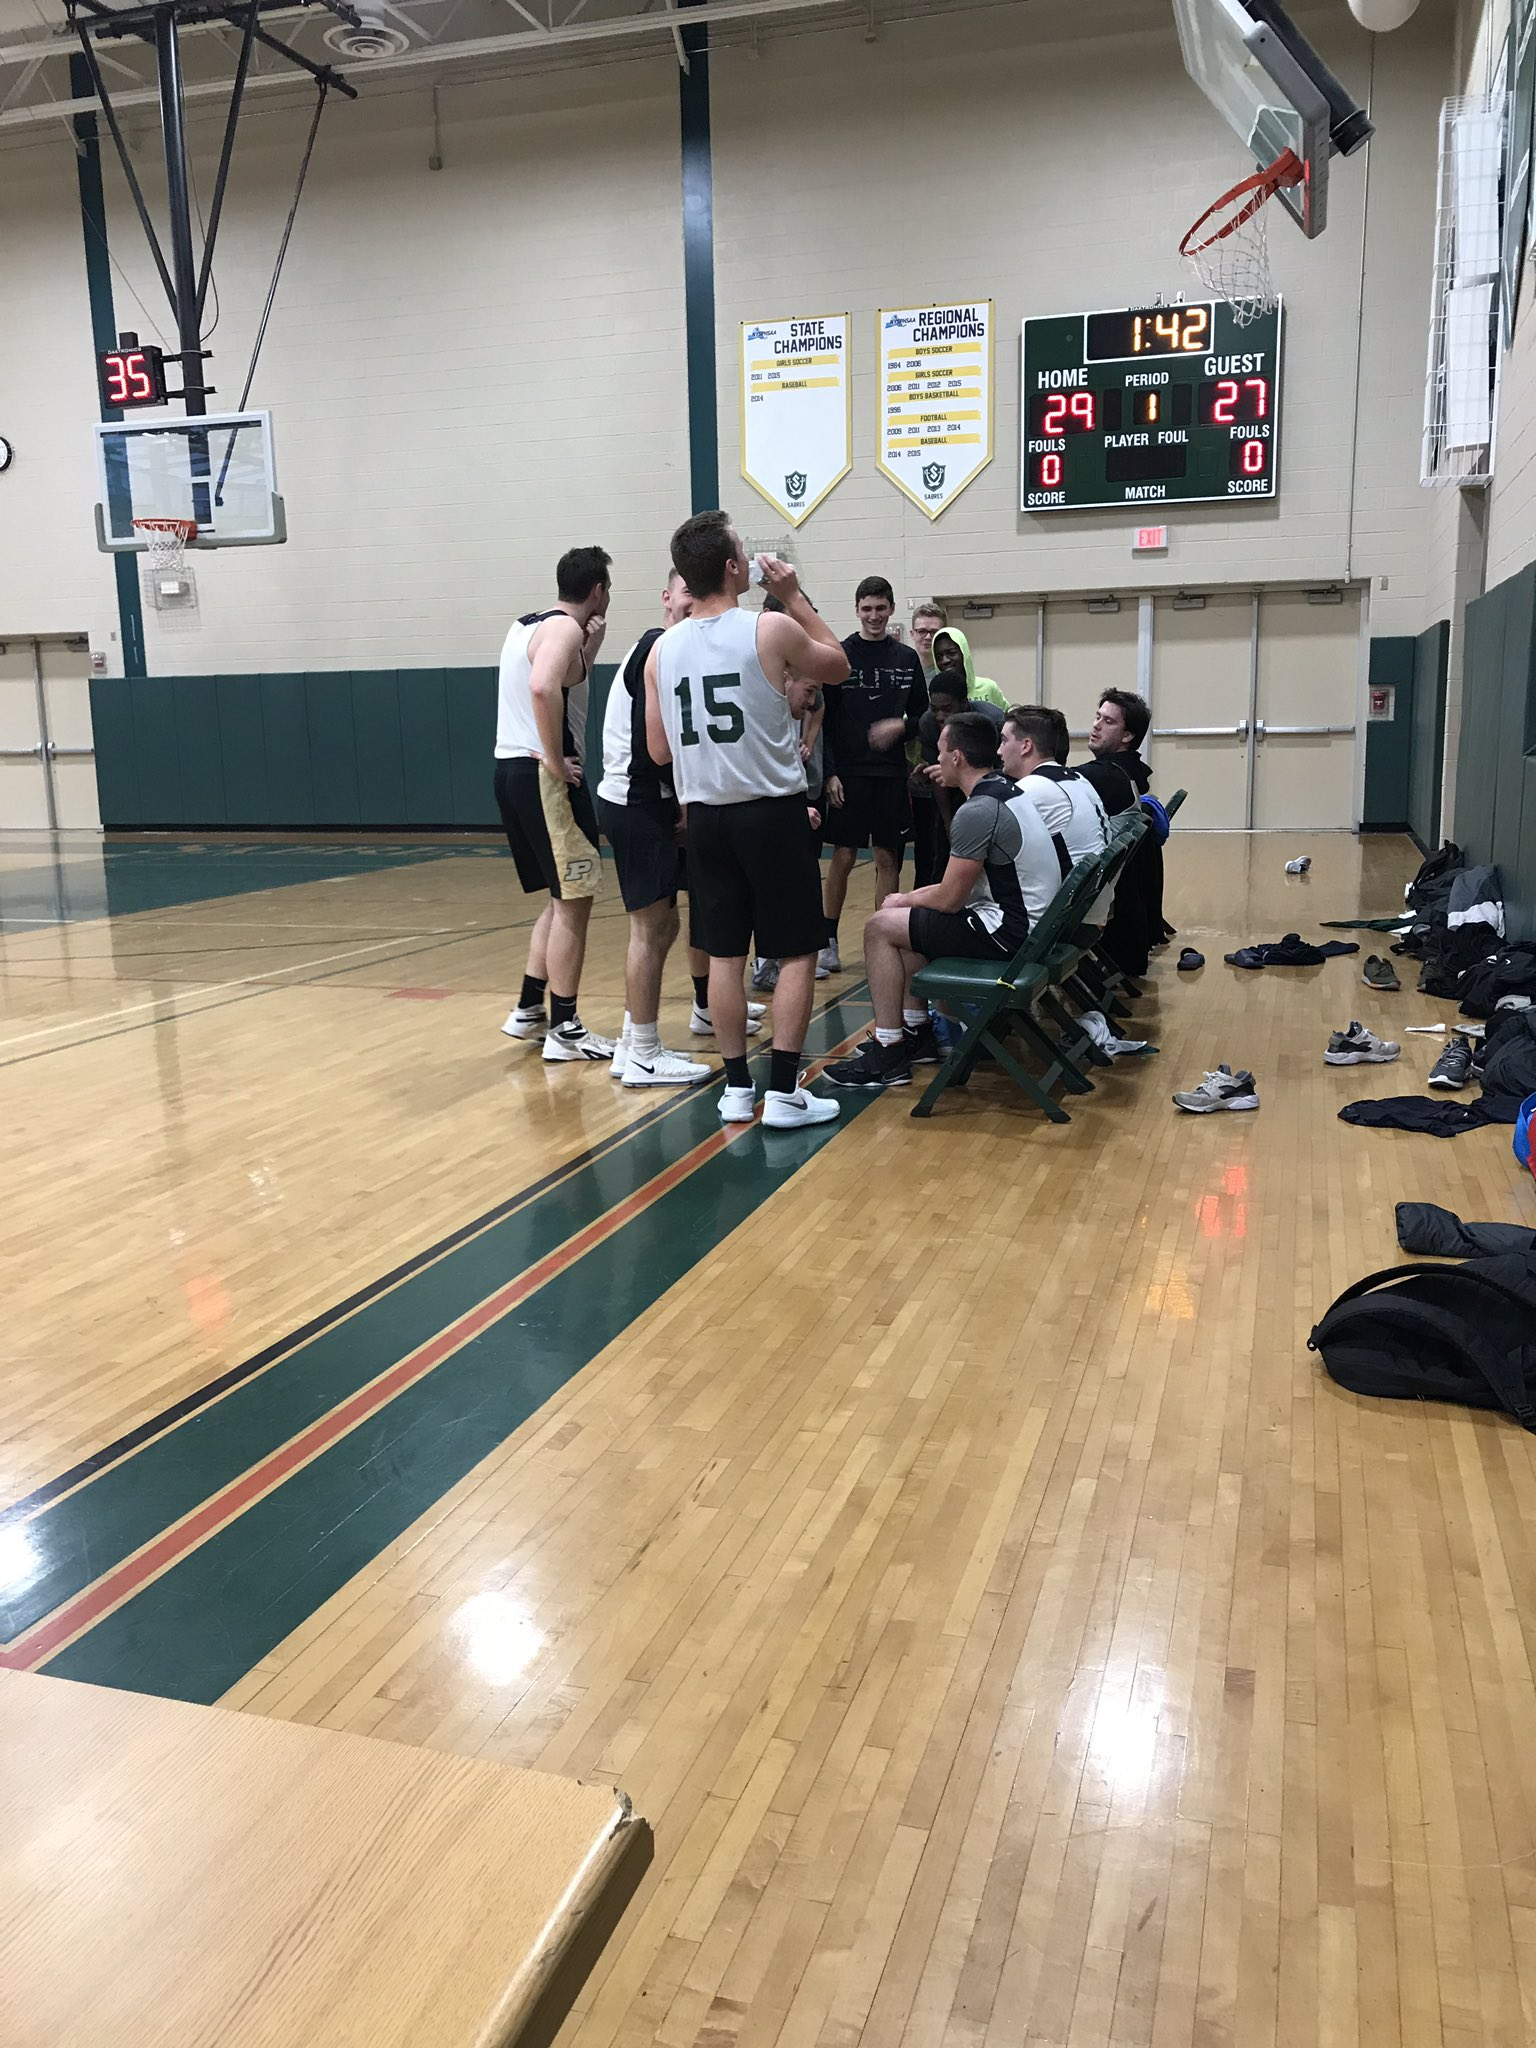 Schalmont Basketball on Twitter: